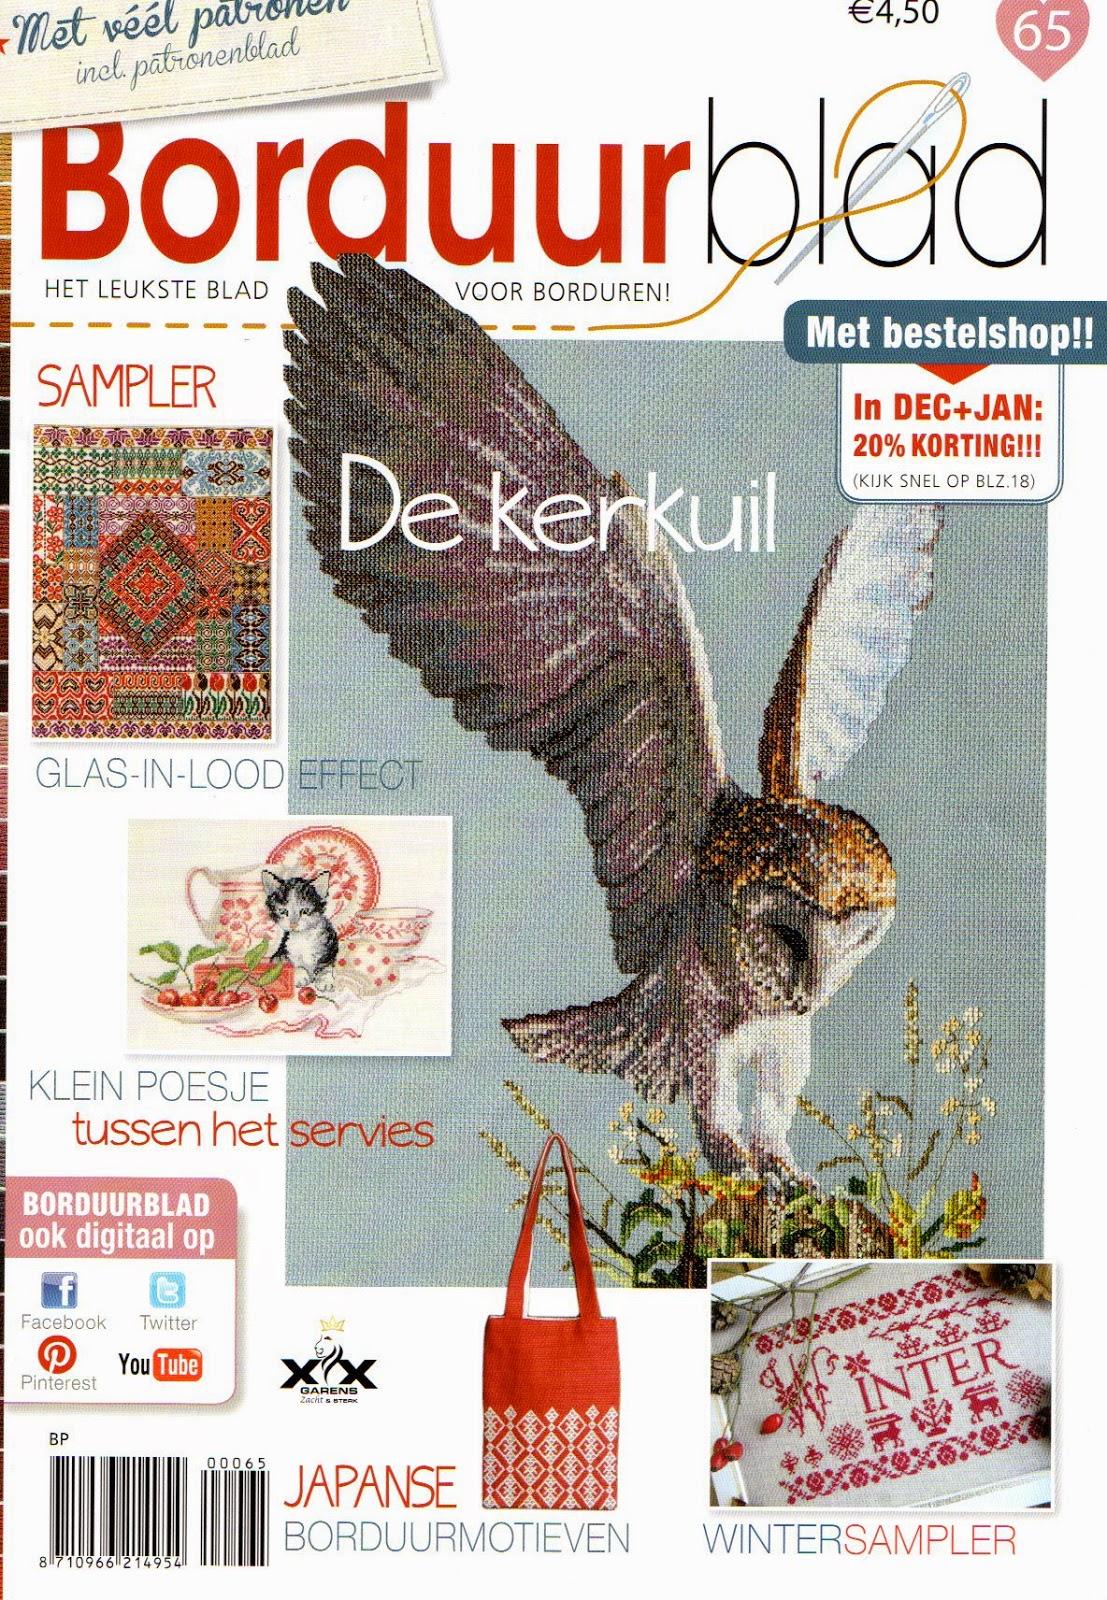 http://www.borduurblad.nl/ned/